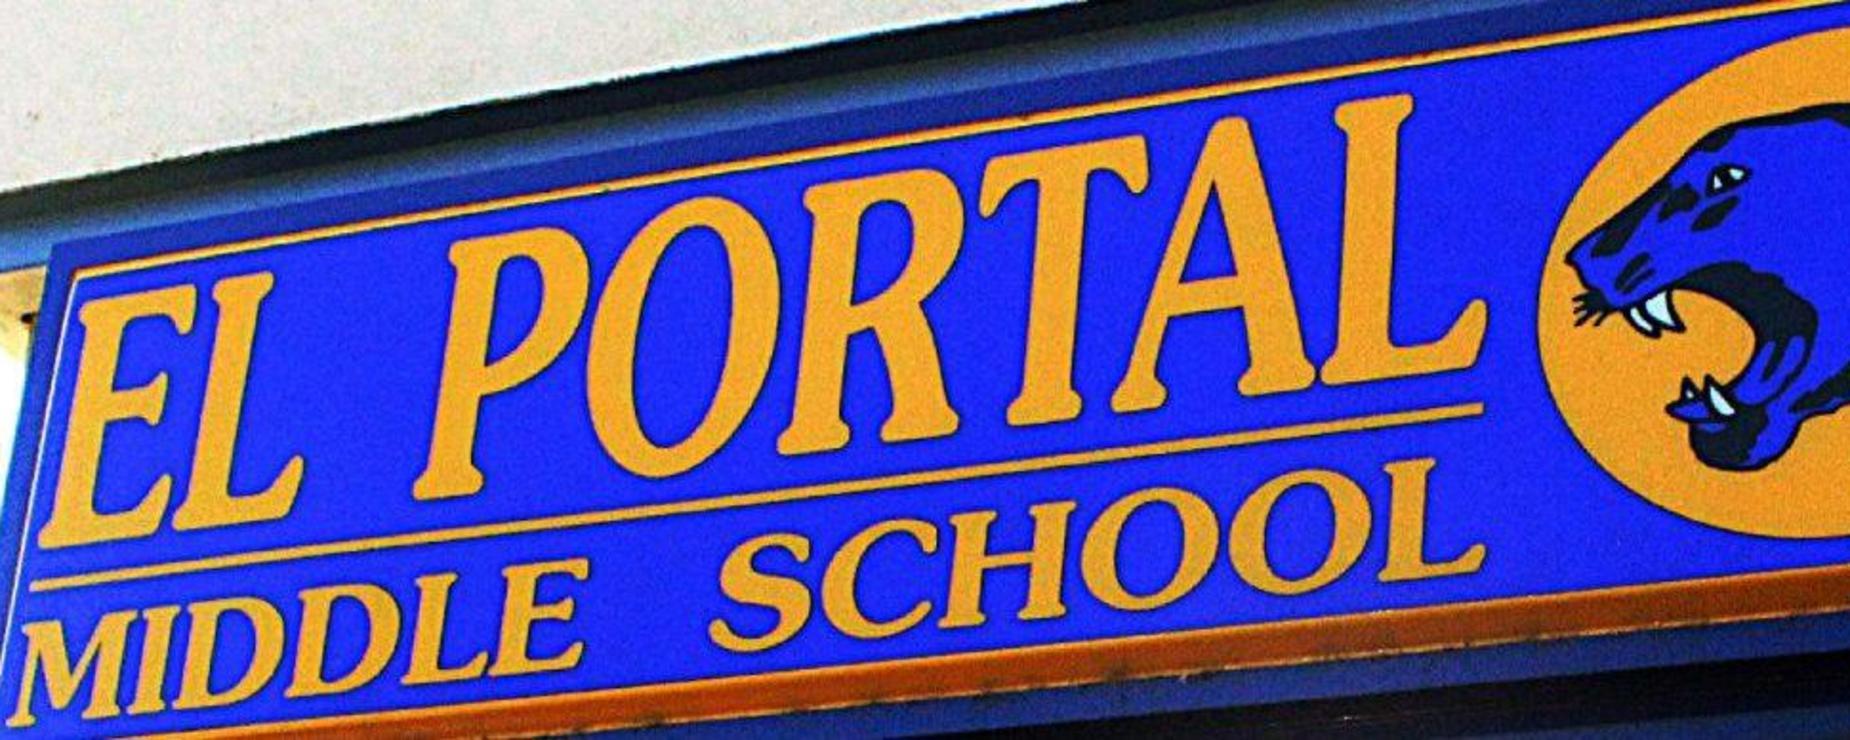 school signage